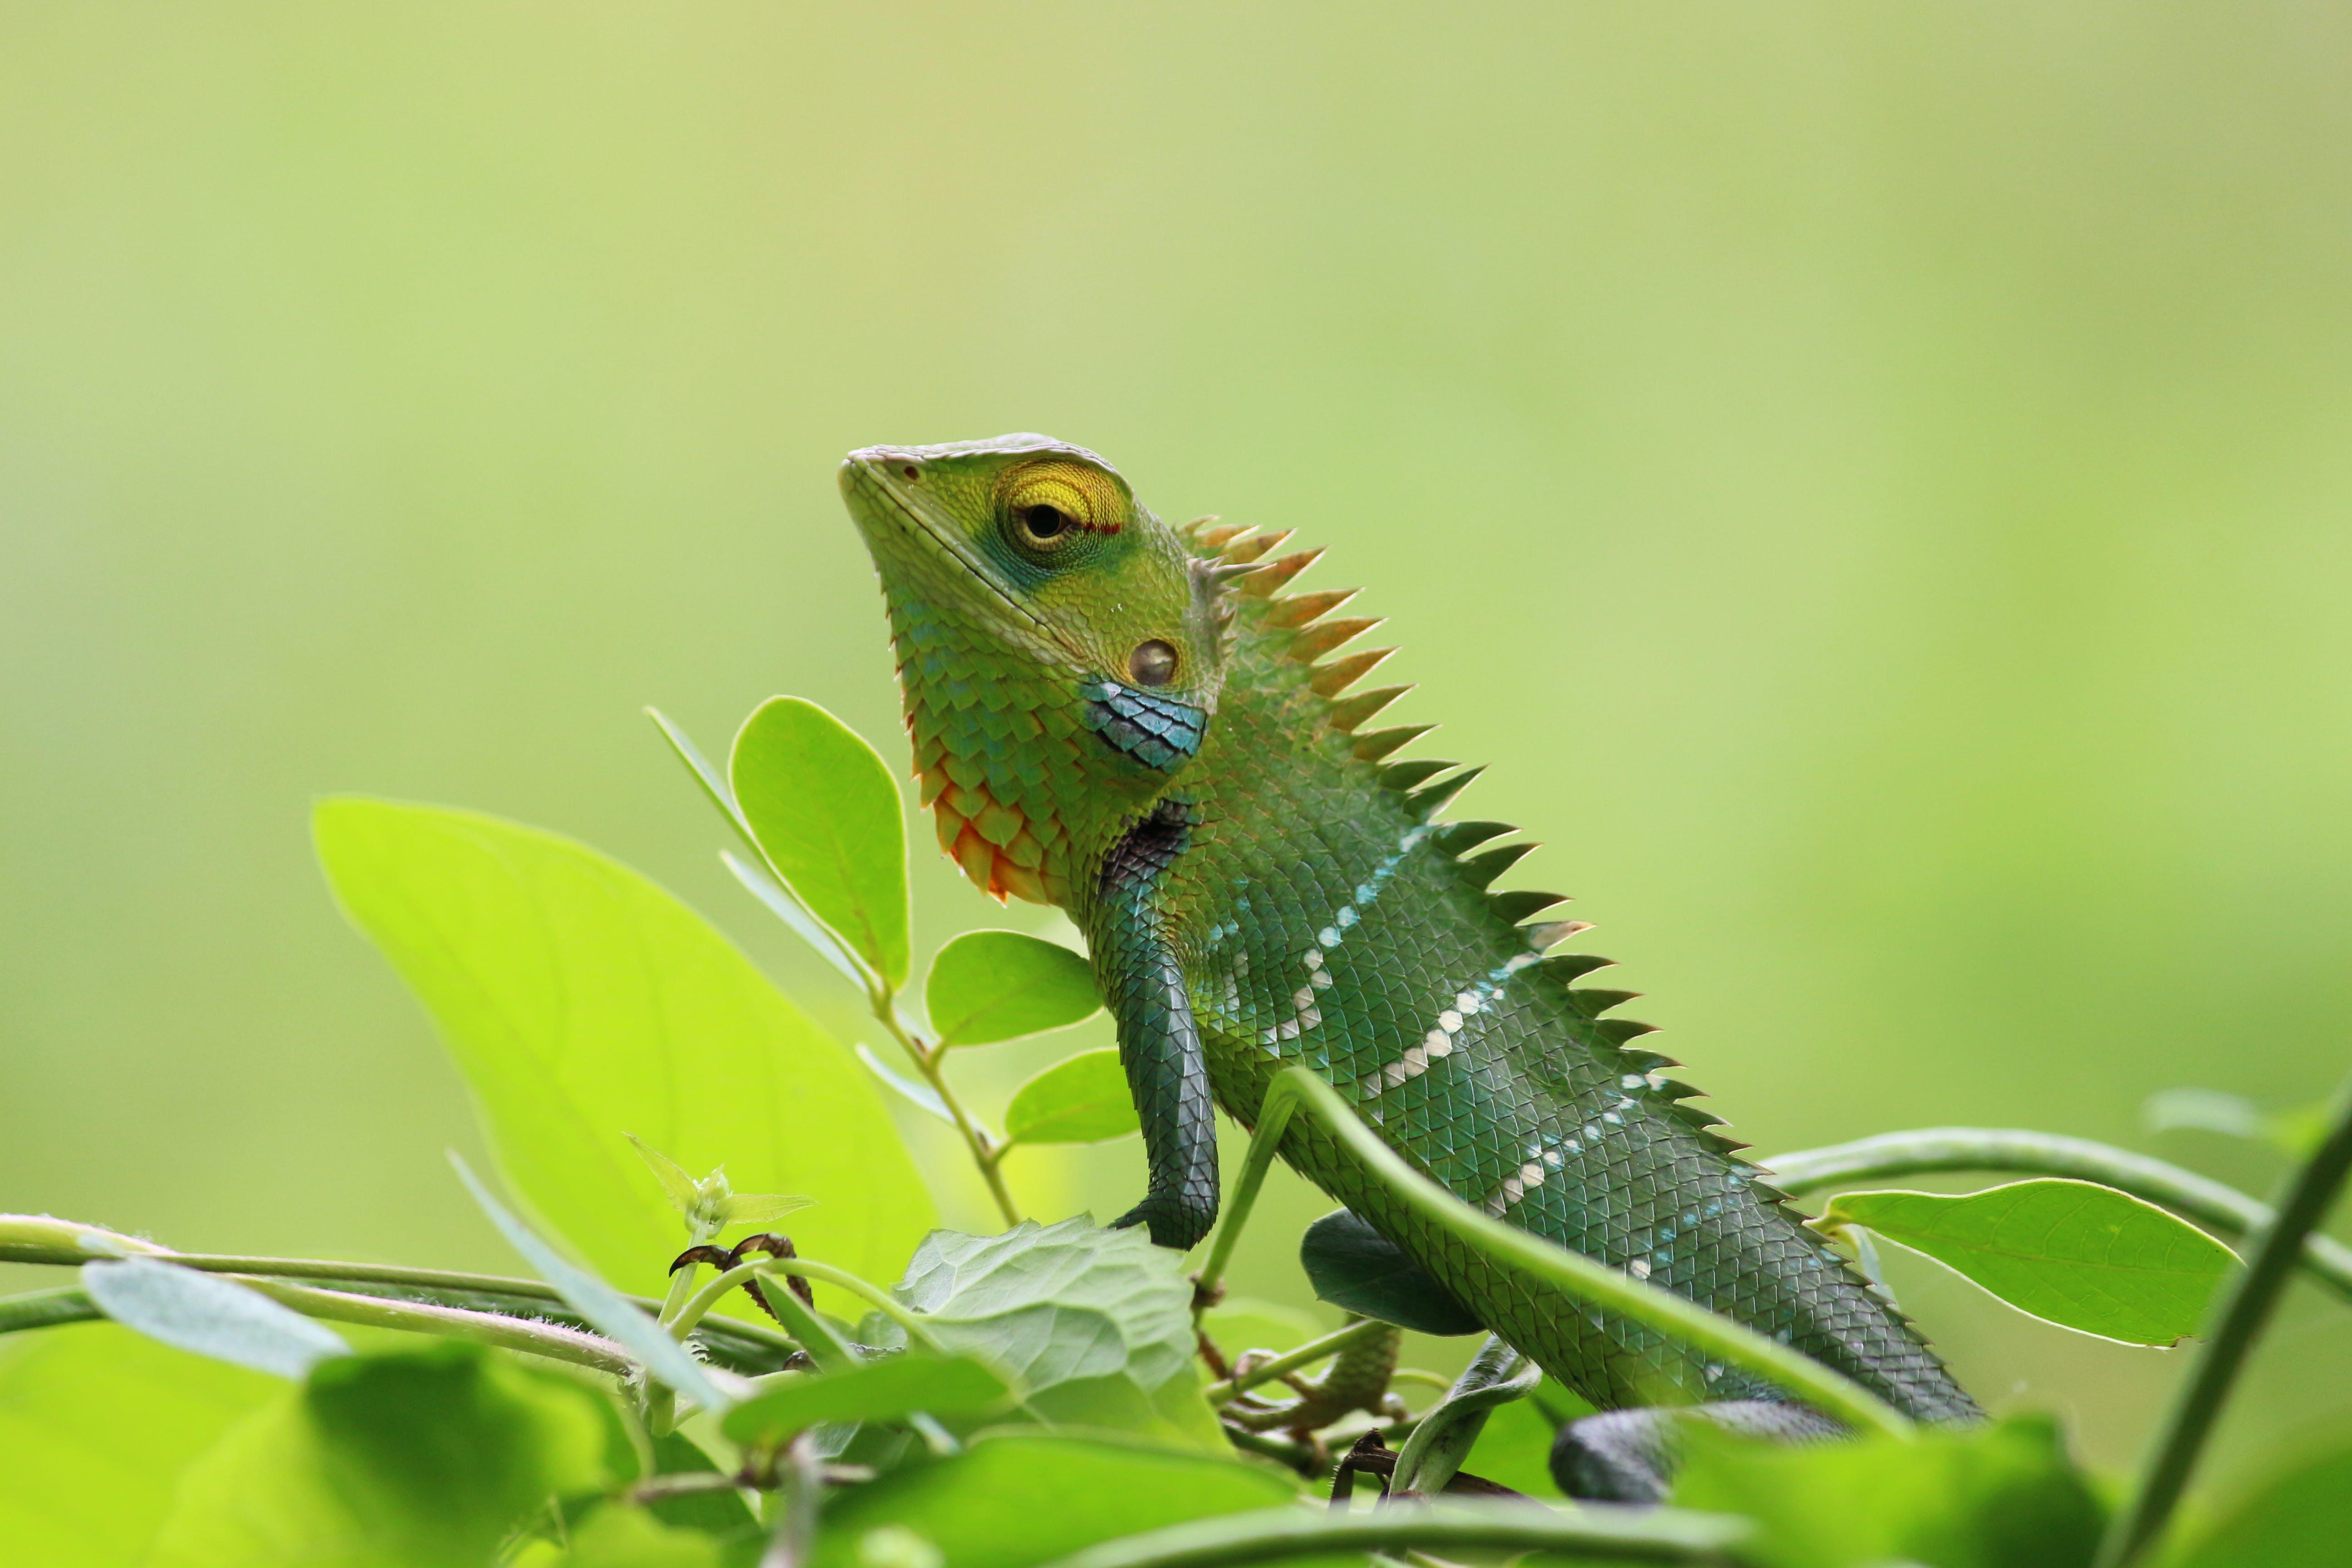 animal, chameleon, close-up